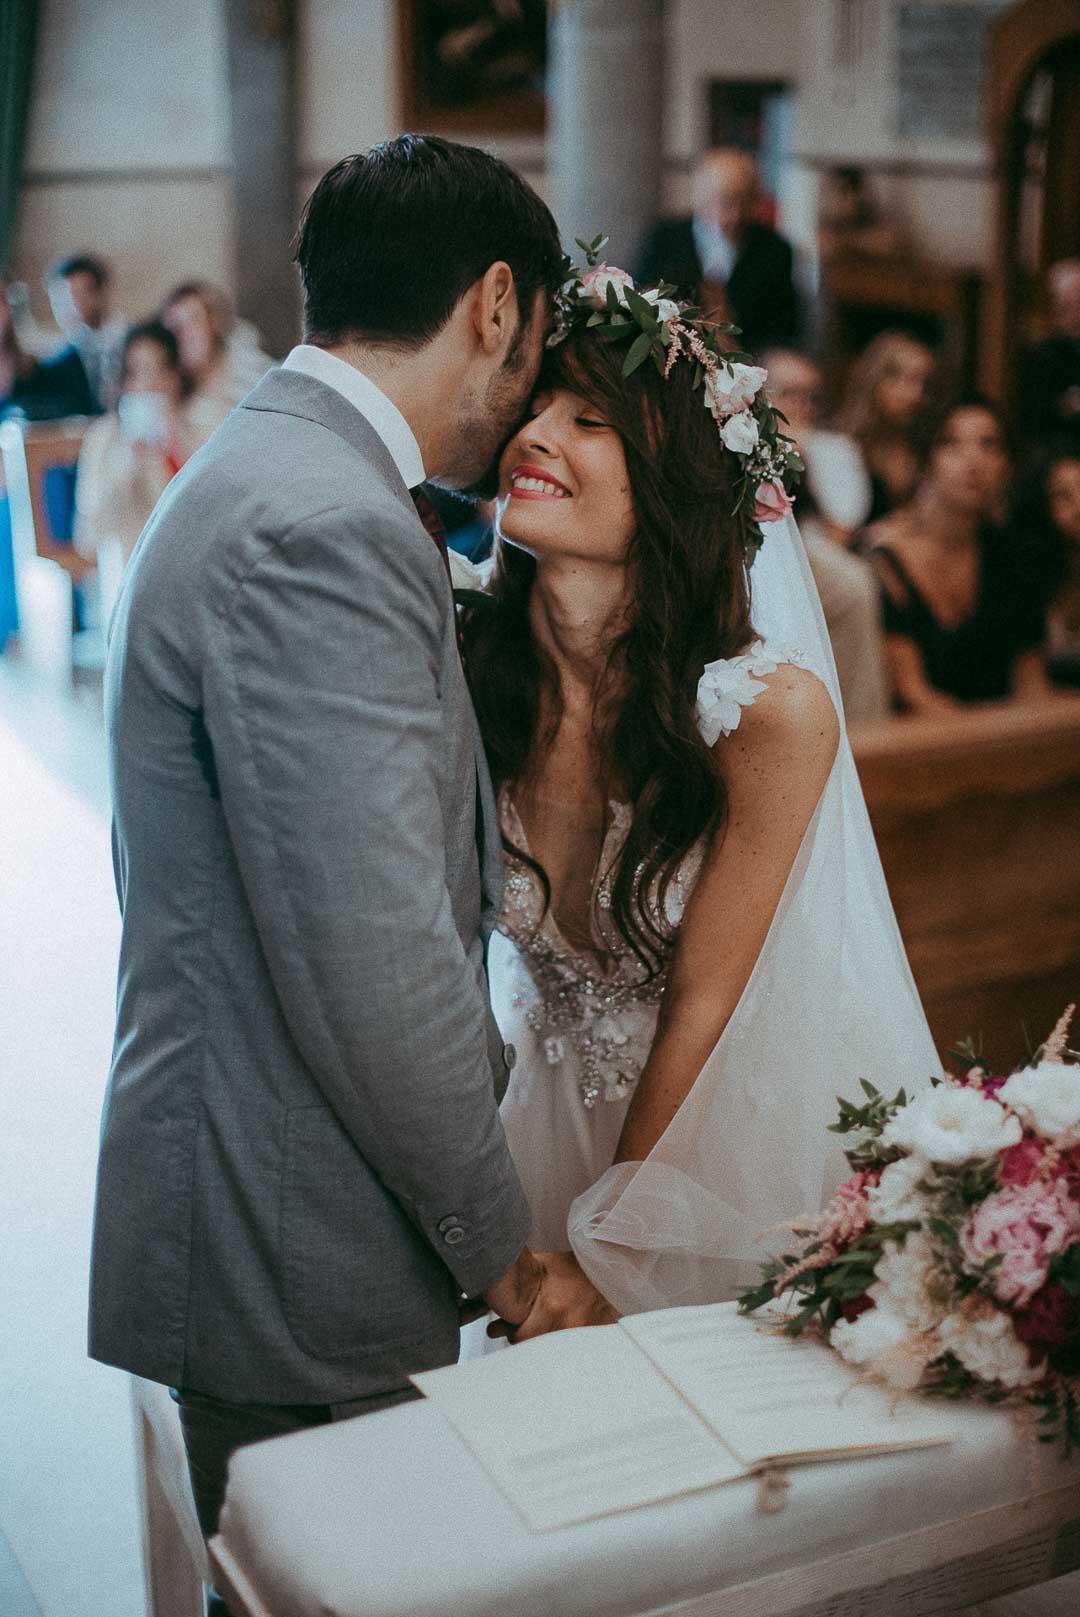 wedding-photographer-destination-fineart-bespoke-reportage-amalficoast-torrelacerniola-vivianeizzo-spazio46-61